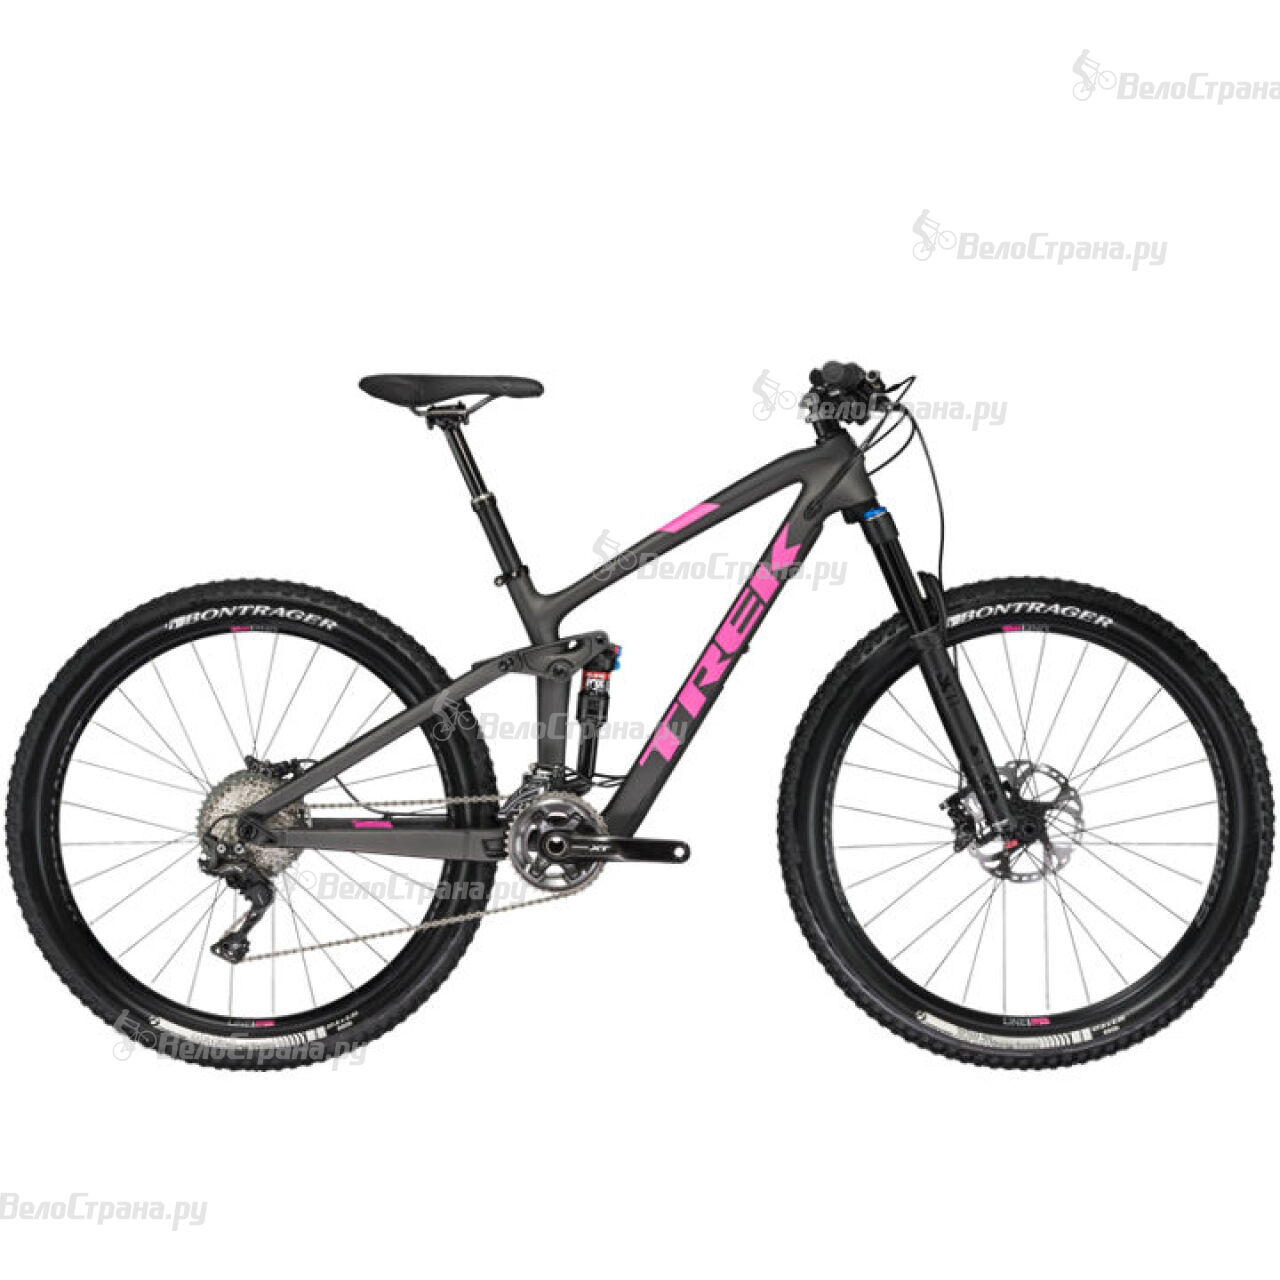 Велосипед Trek Fuel EX 9.8 WSD (2017) trek fuel ex 9 27 5